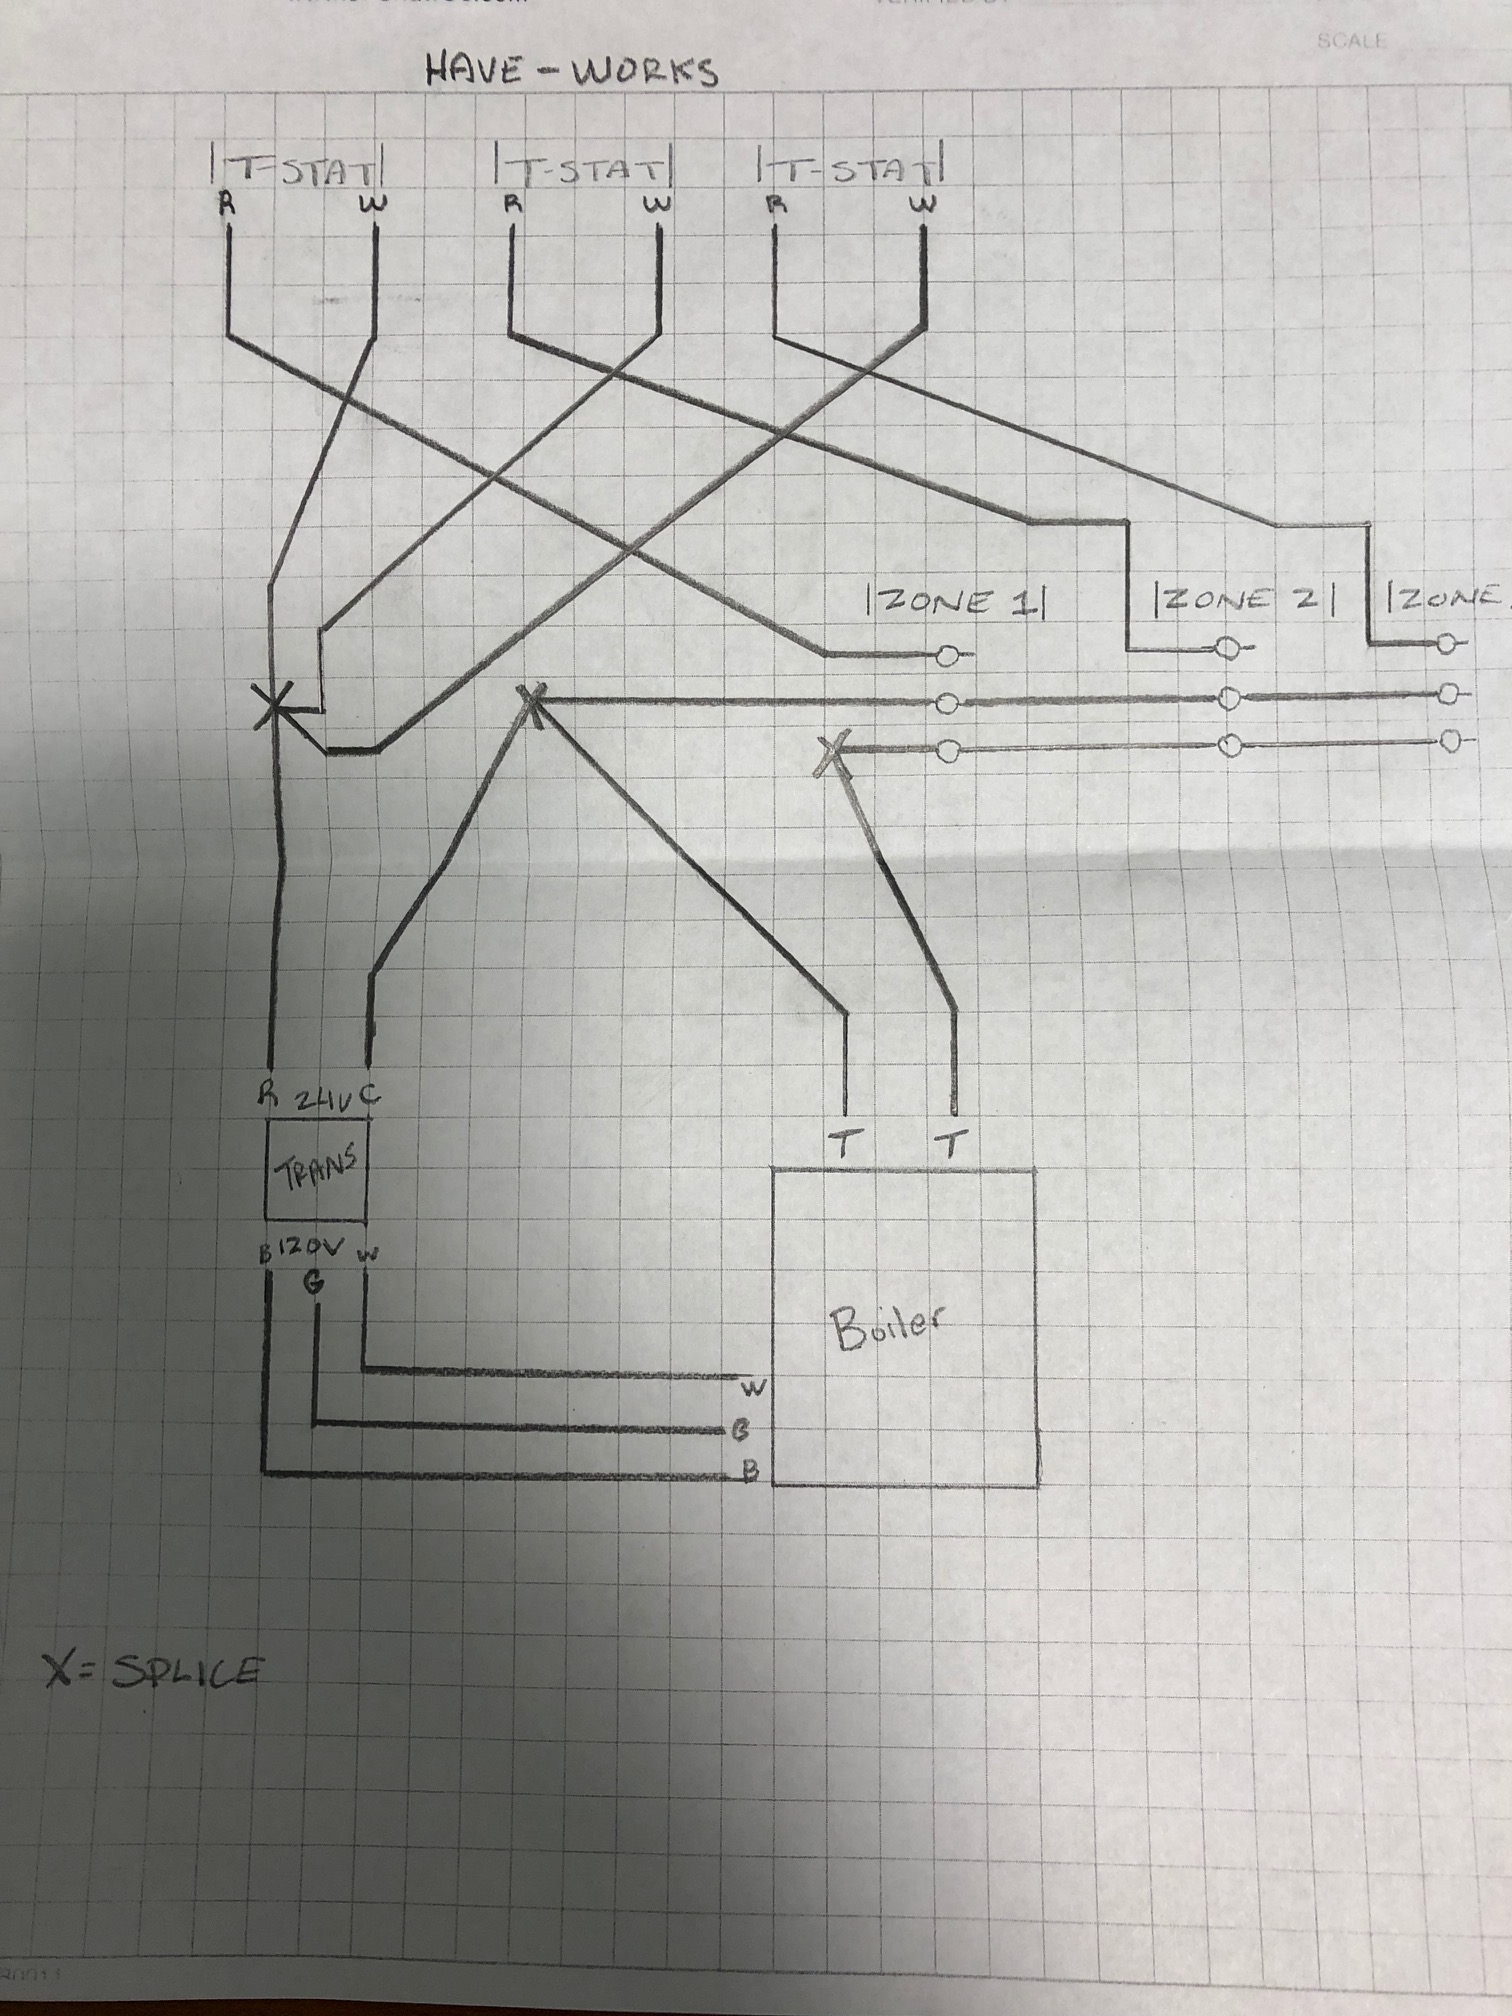 Zone Valve Wiring Taco Zone Valve Wiring Diagram Zone Valves Wiring